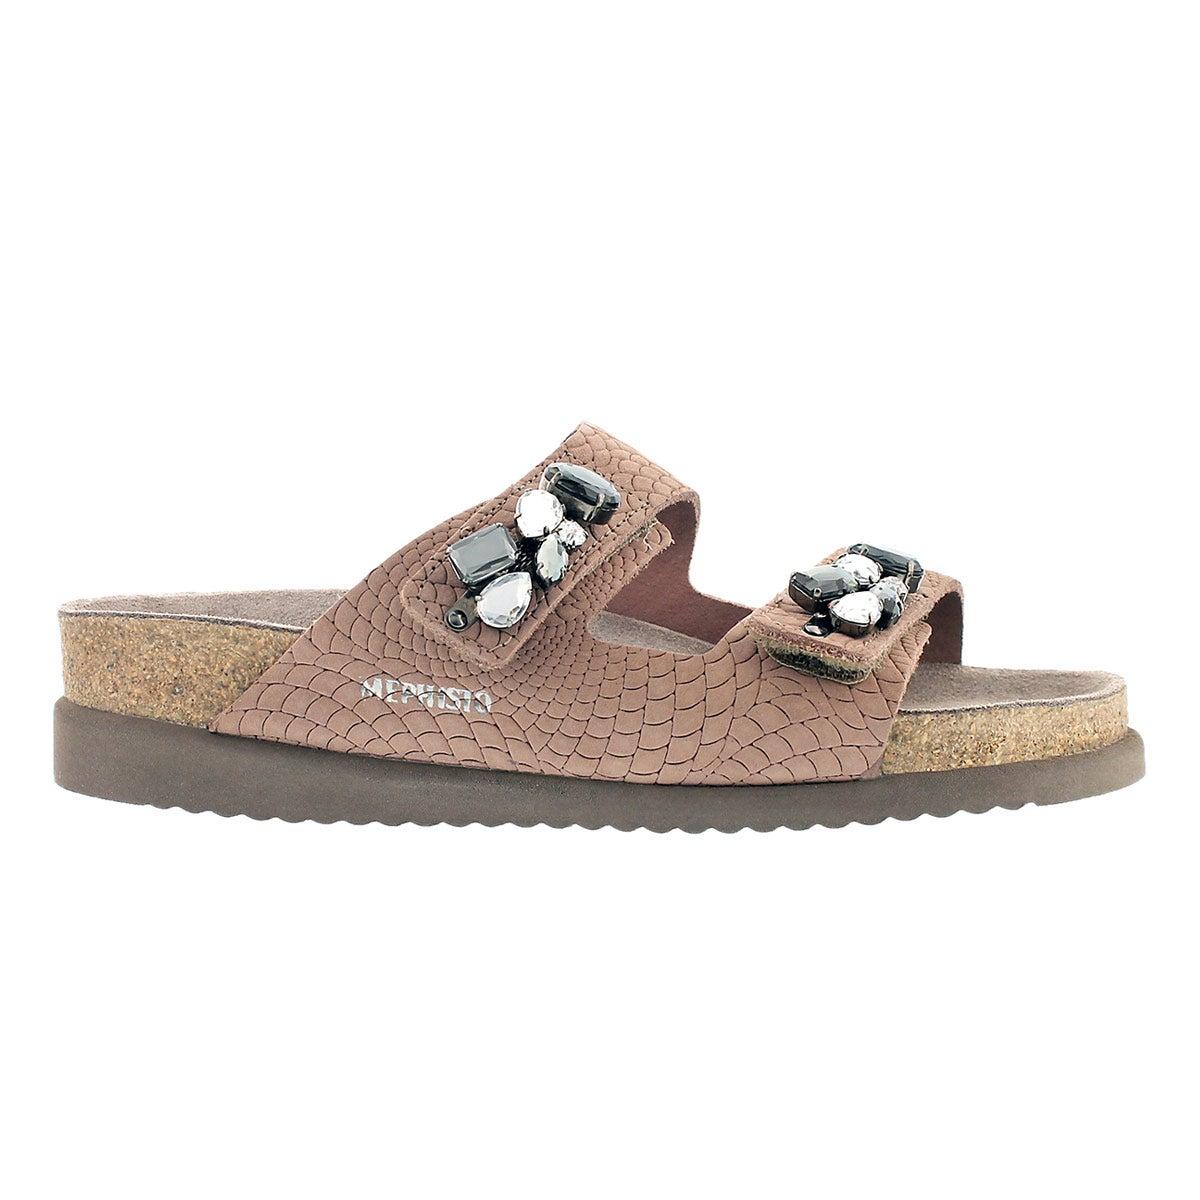 Lds Hana pink rio cork footbed sandal